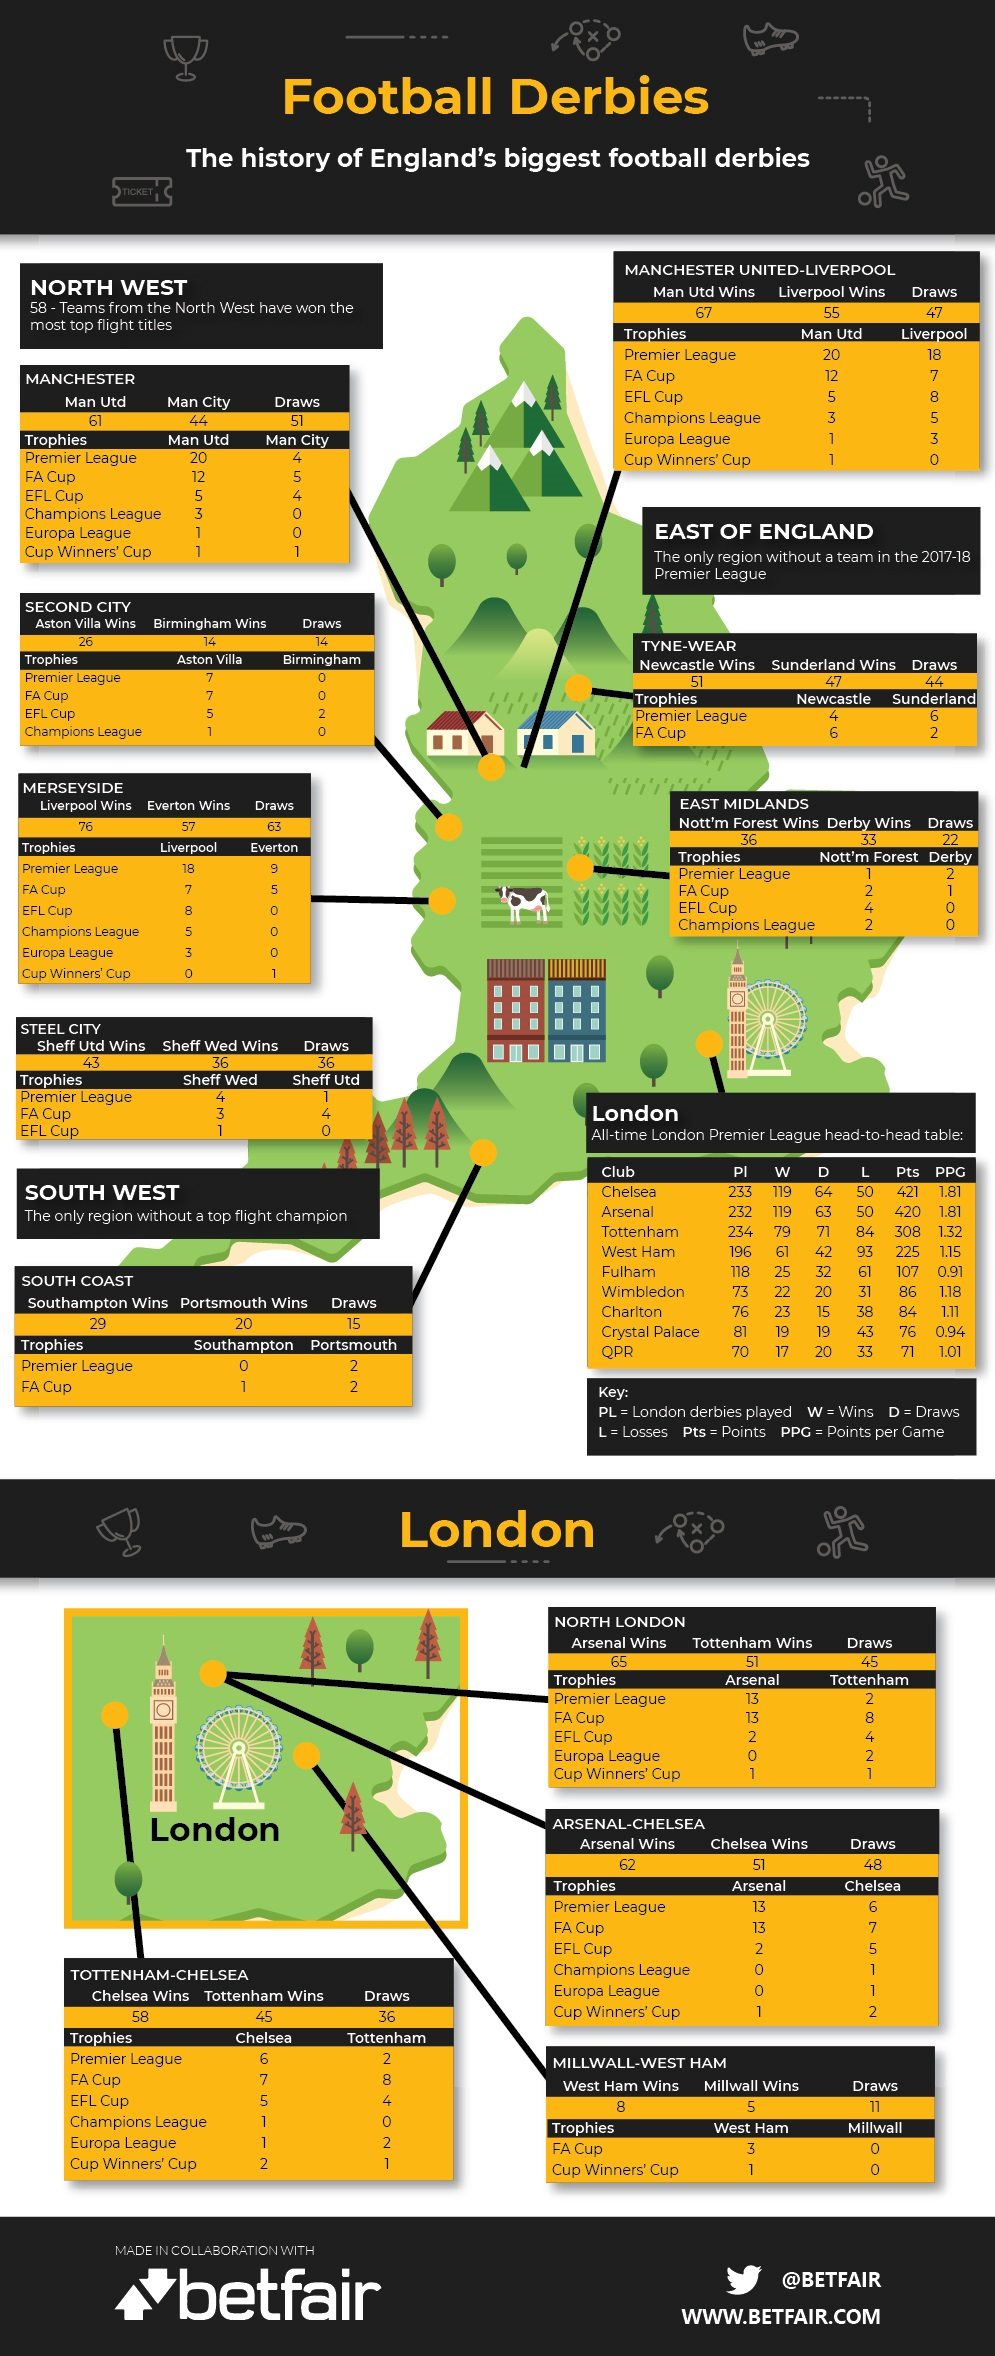 Football Derbies infographic